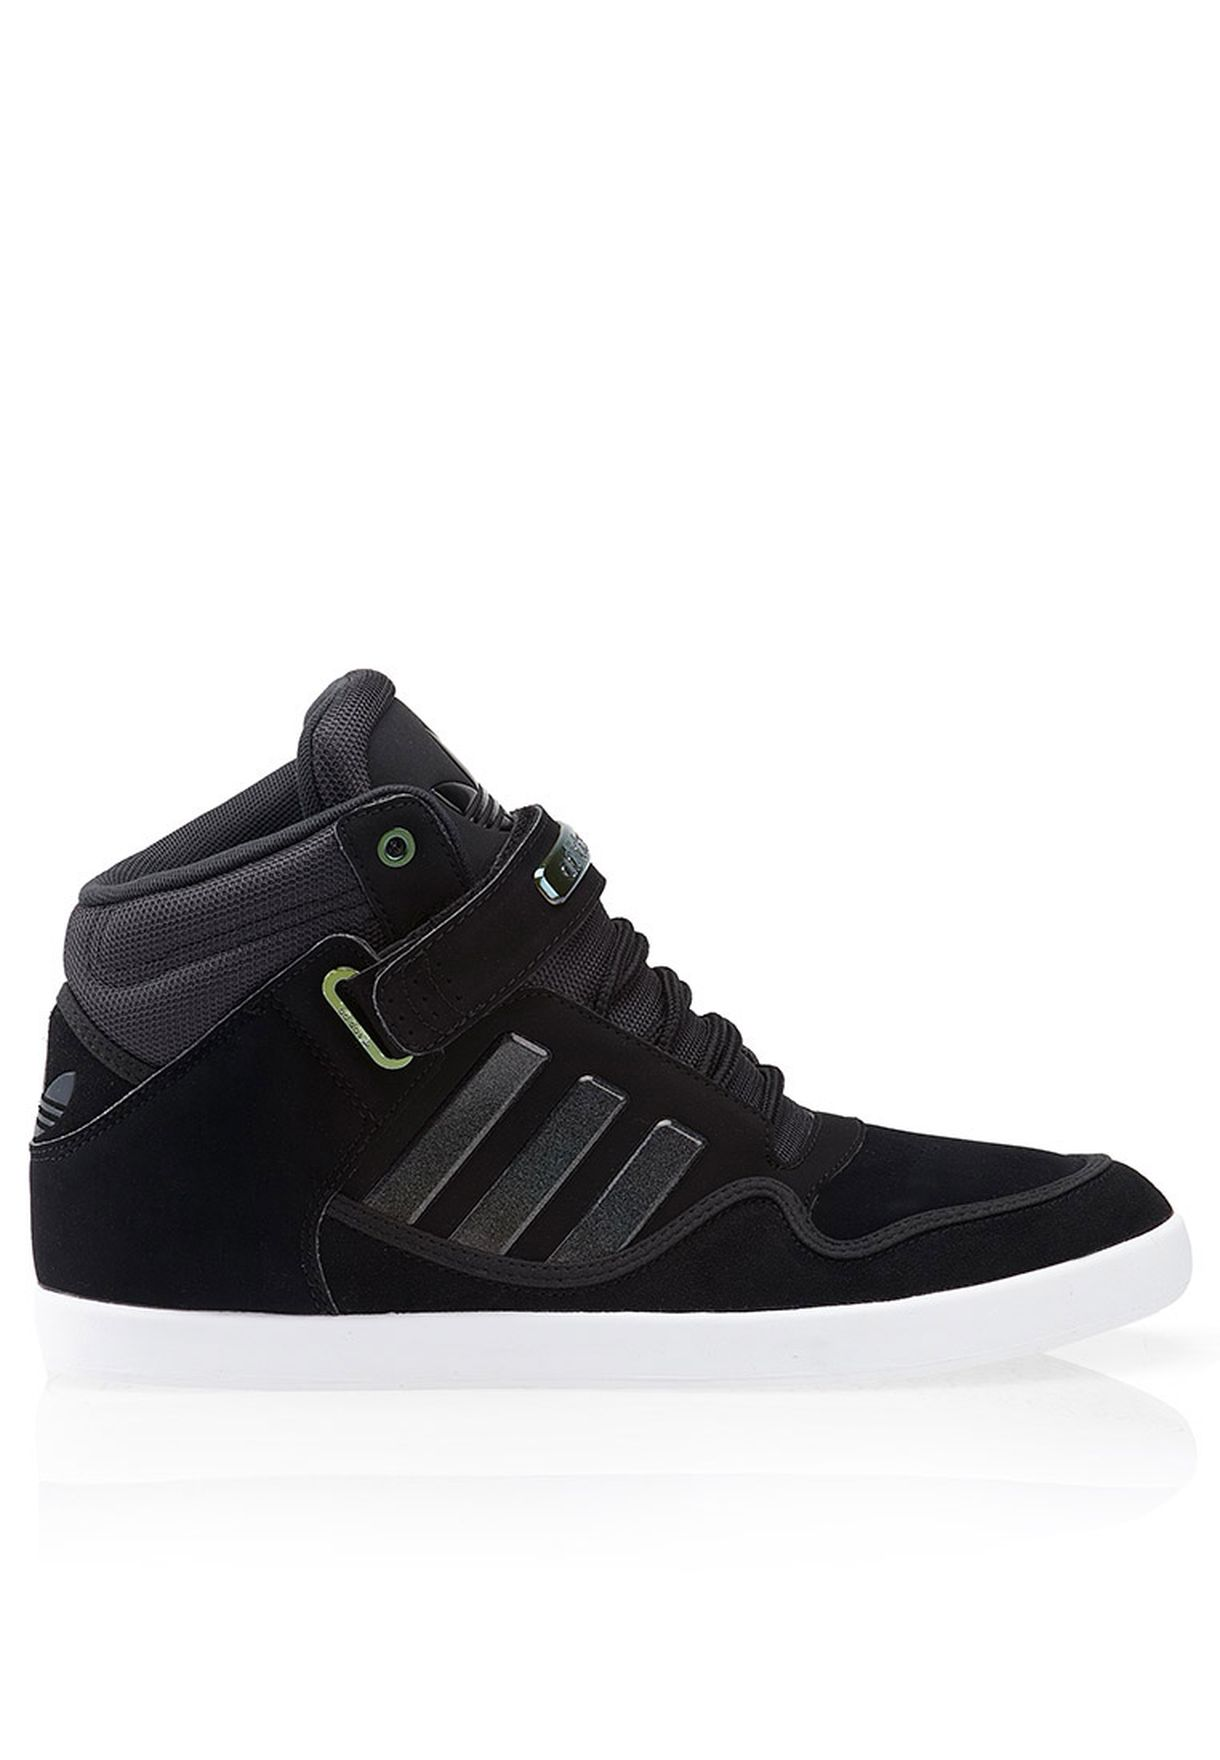 62c4baaed7920f Shop adidas Originals black AR 2.0 D65686 for Men in Qatar ...